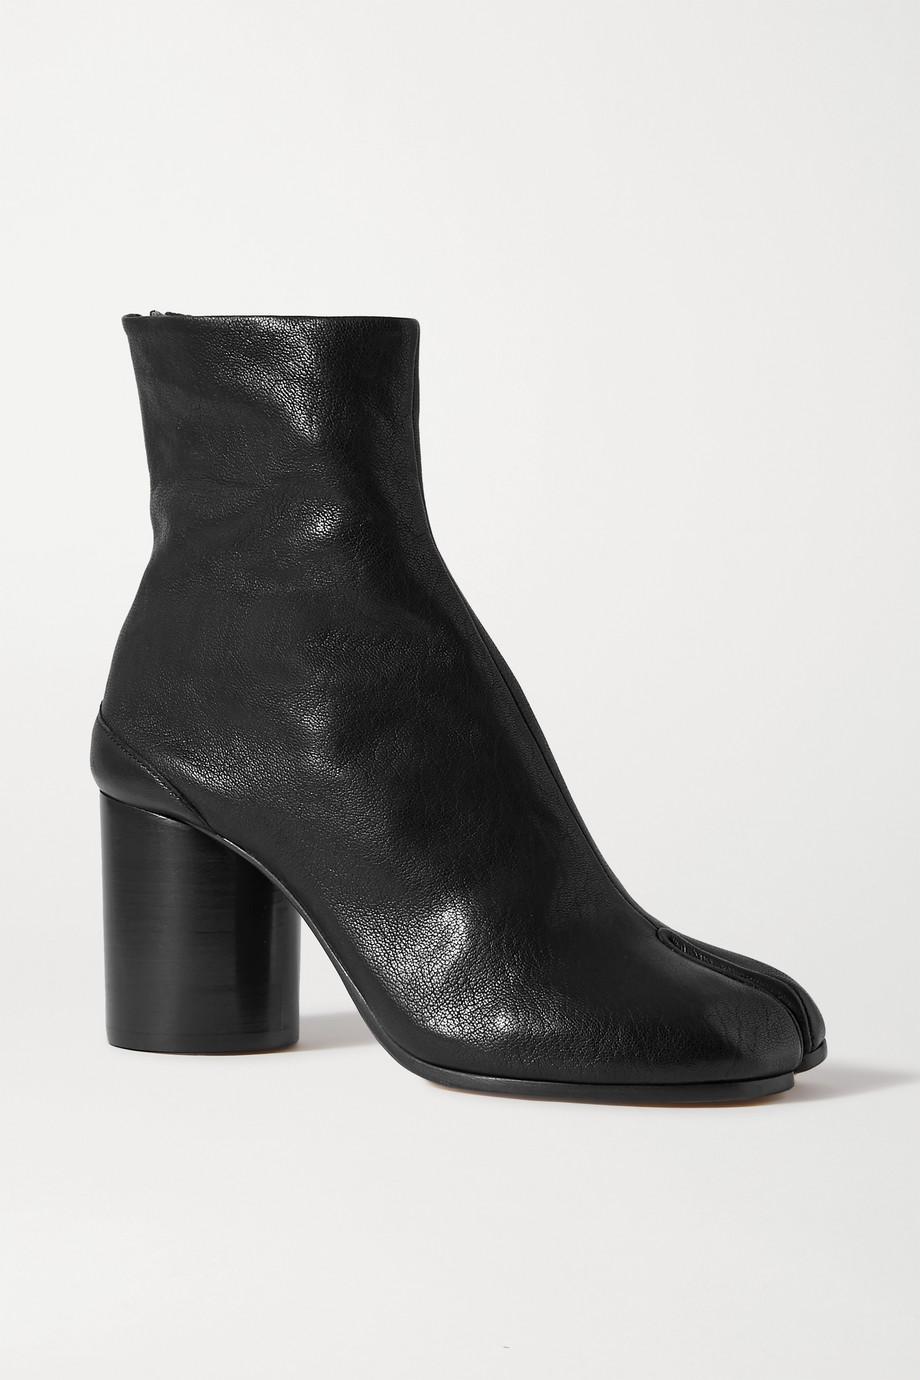 Maison Margiela Tabi 分趾皮革踝靴